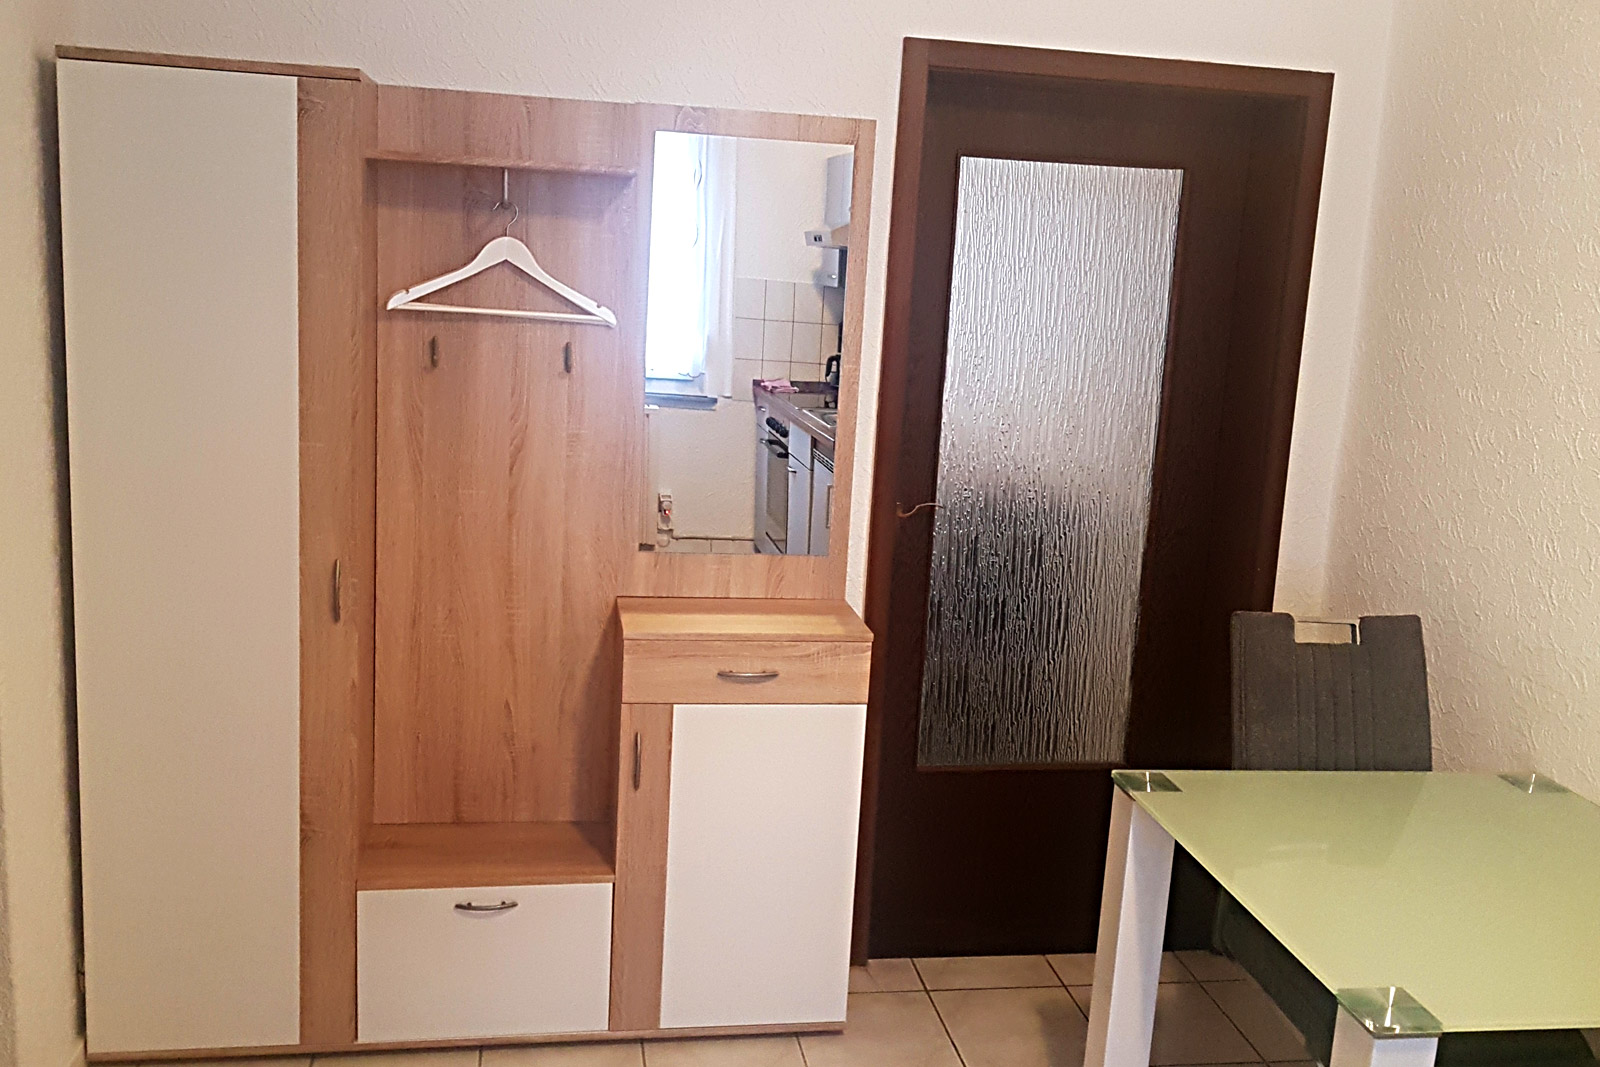 1 zimmer appartements in villingen schwenningen schwarzwald. Black Bedroom Furniture Sets. Home Design Ideas